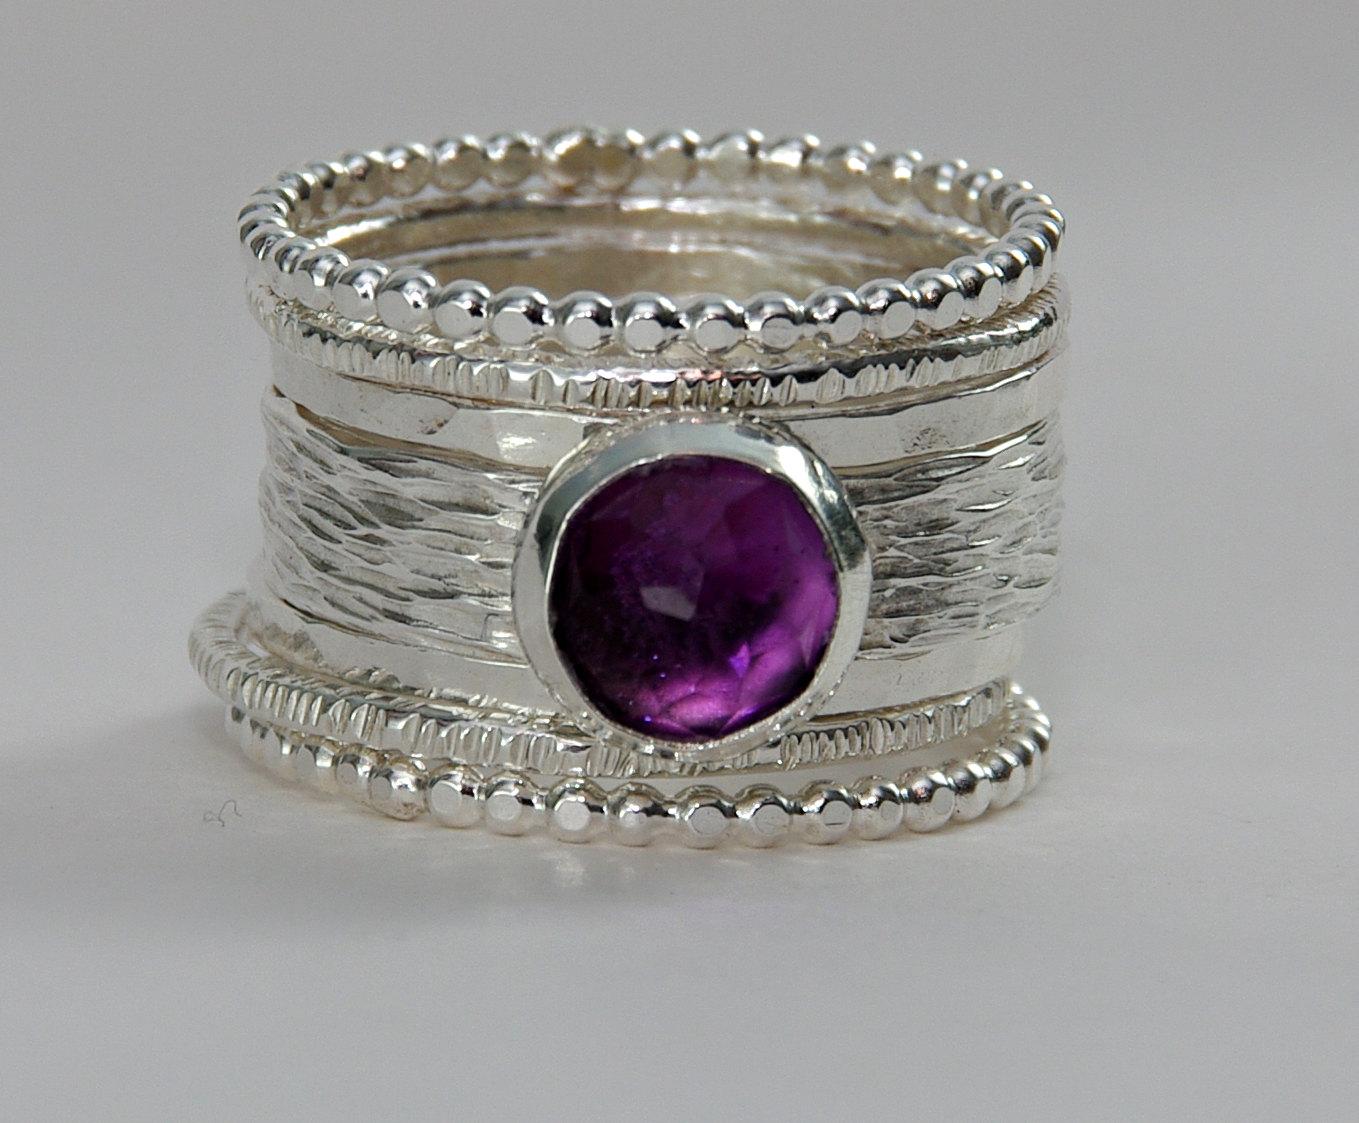 unique rose cut purple amethyst wedding ring purple wedding rings Unique Rose Cut Purple Amethyst Wedding Ring Thumbnail 1